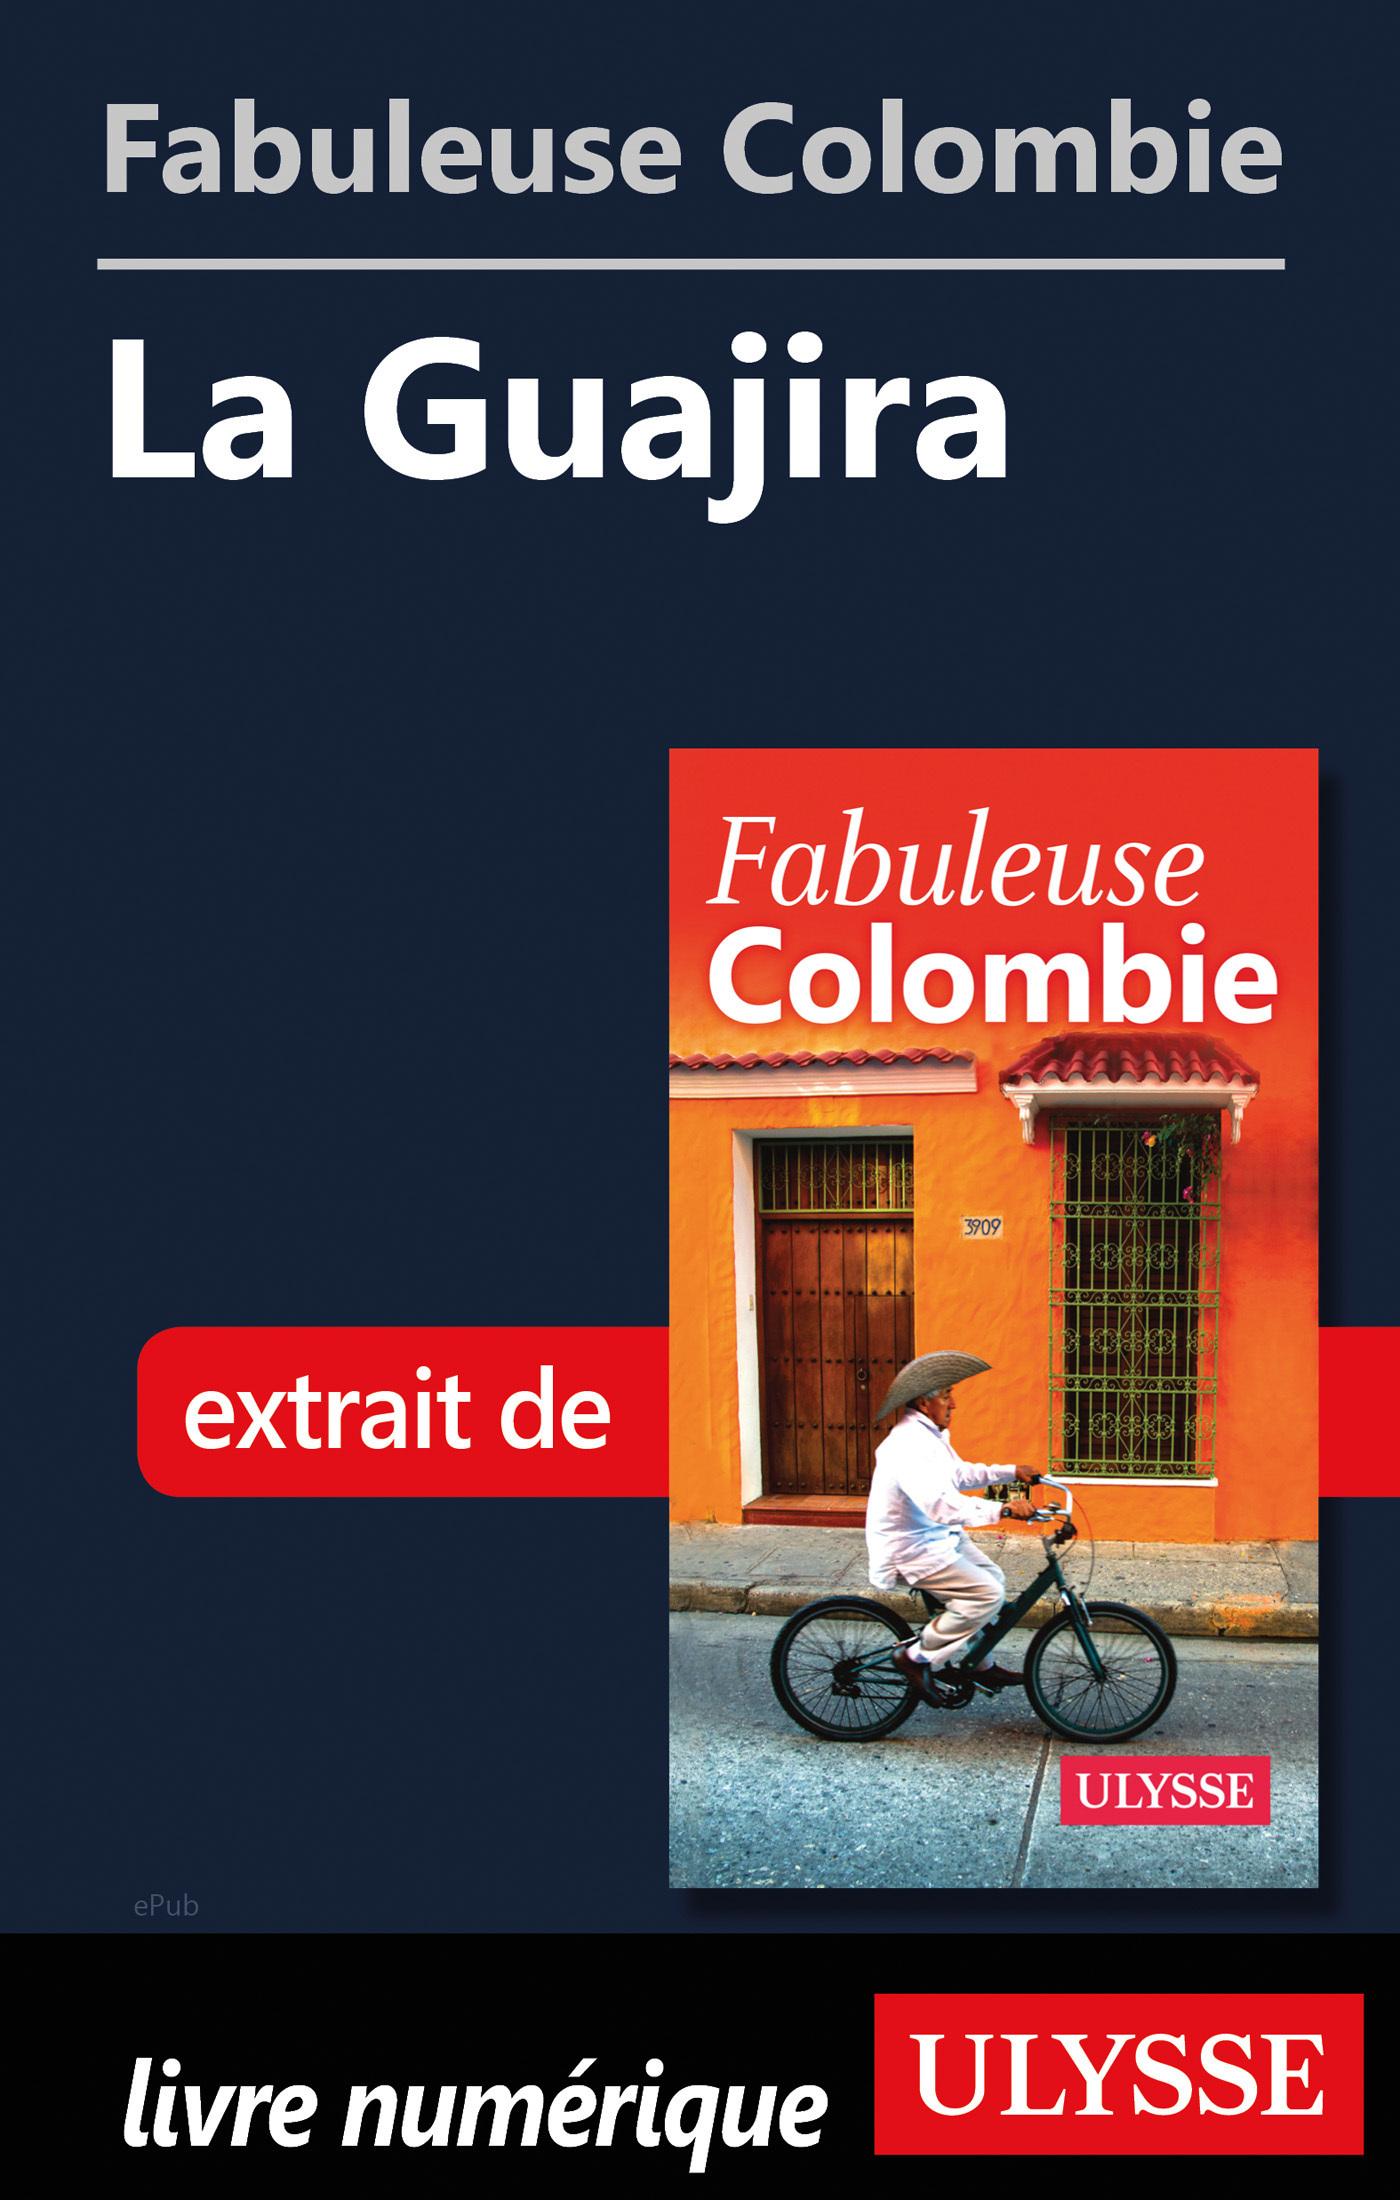 Fabuleuse Colombie: La Guajira